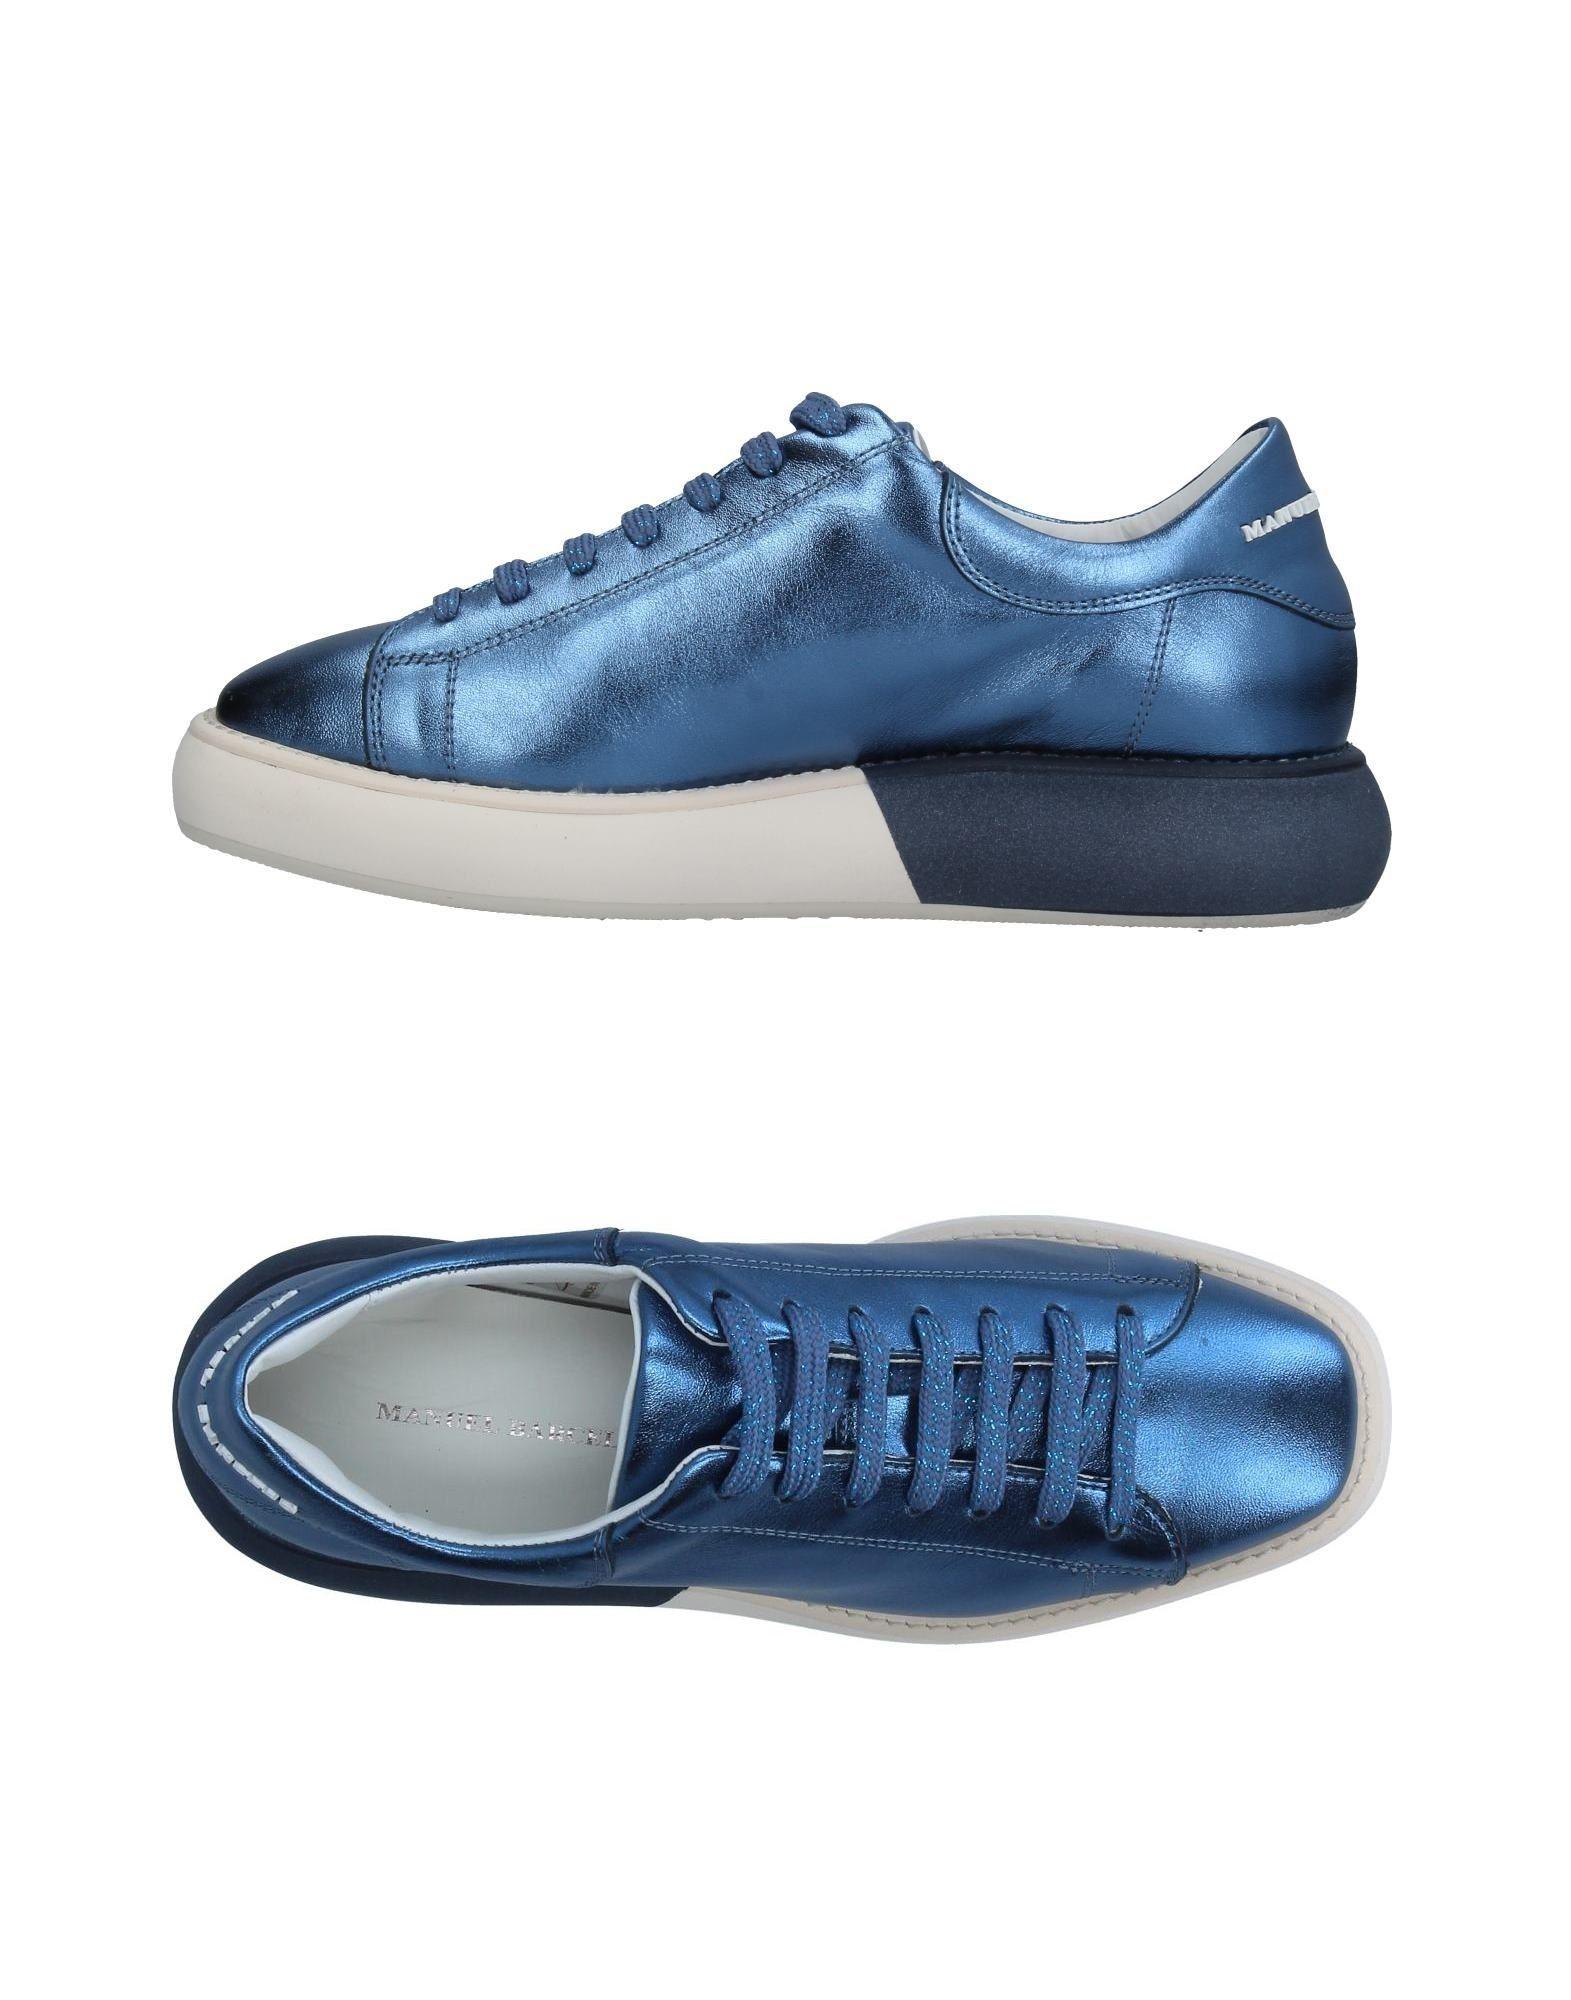 Manuel Barceló Damen Sneakers Damen Barceló  11332047OK Neue Schuhe 8f20d6